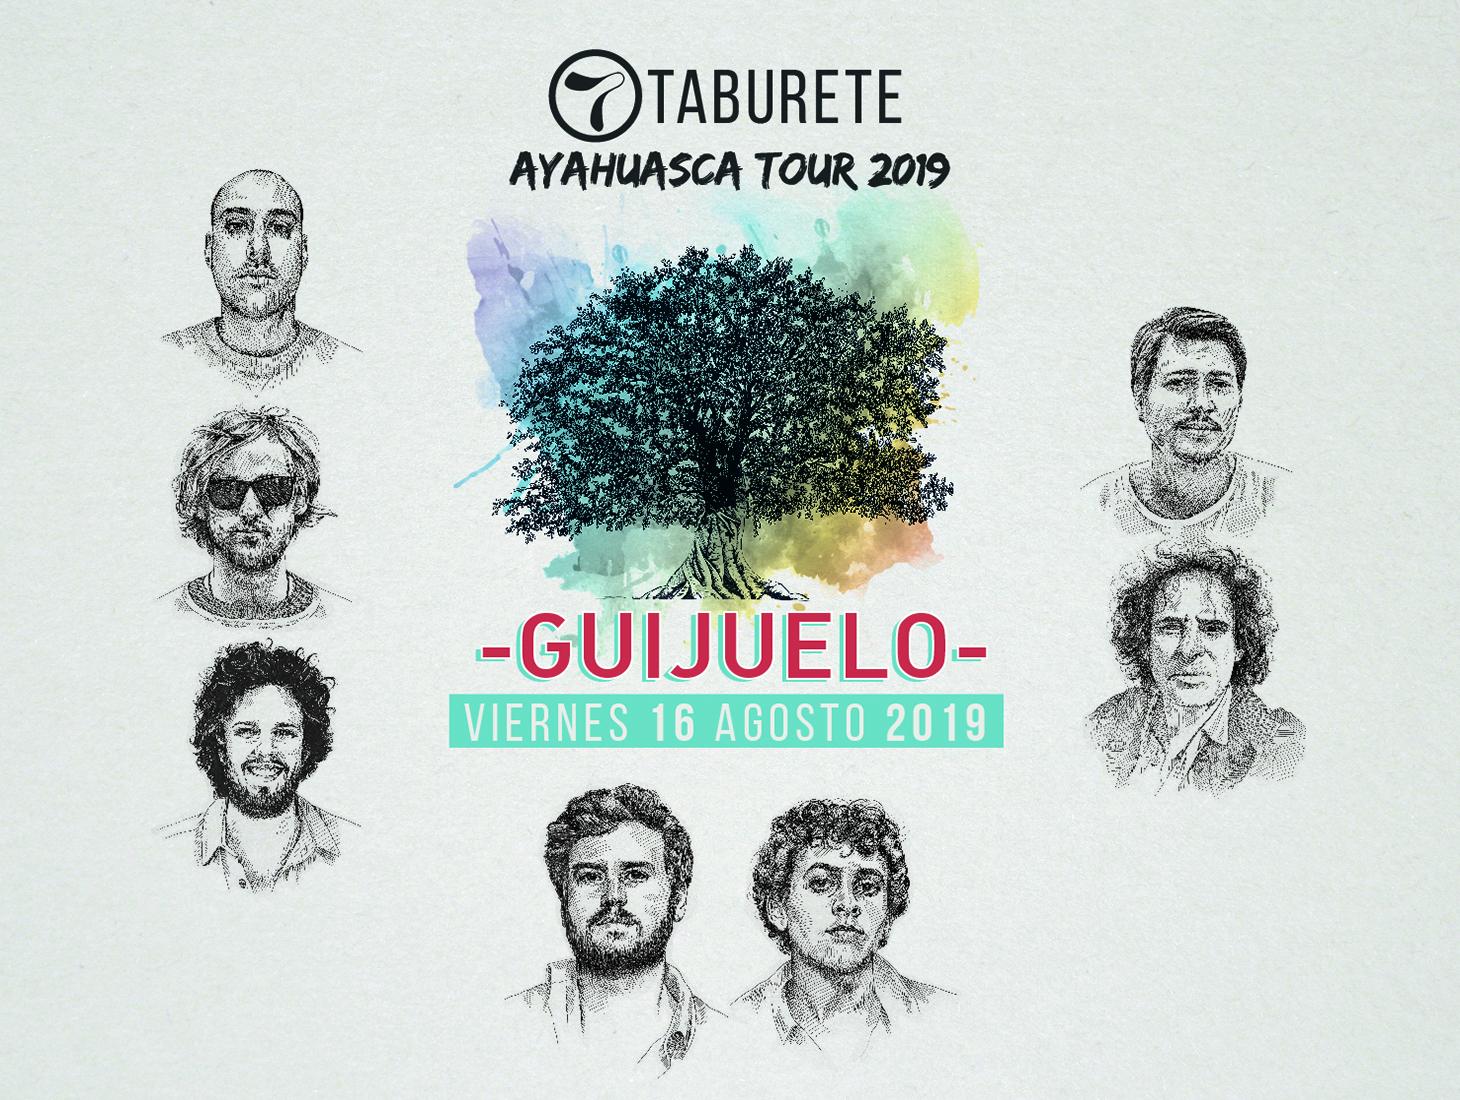 taburete-ayahuasca-tour-guijuelo-2019-5c